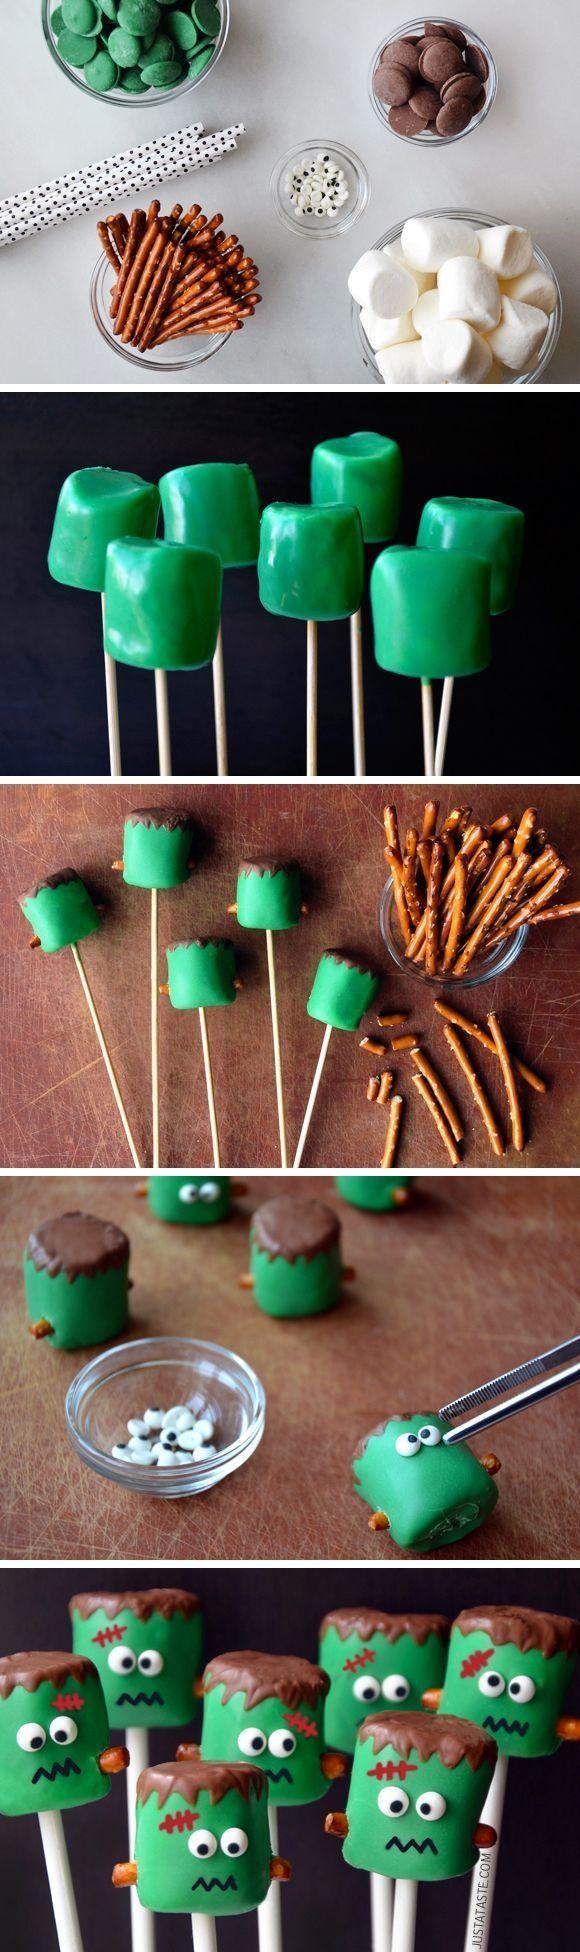 Best 25+ Cute halloween food ideas on Pinterest | Halloween ...